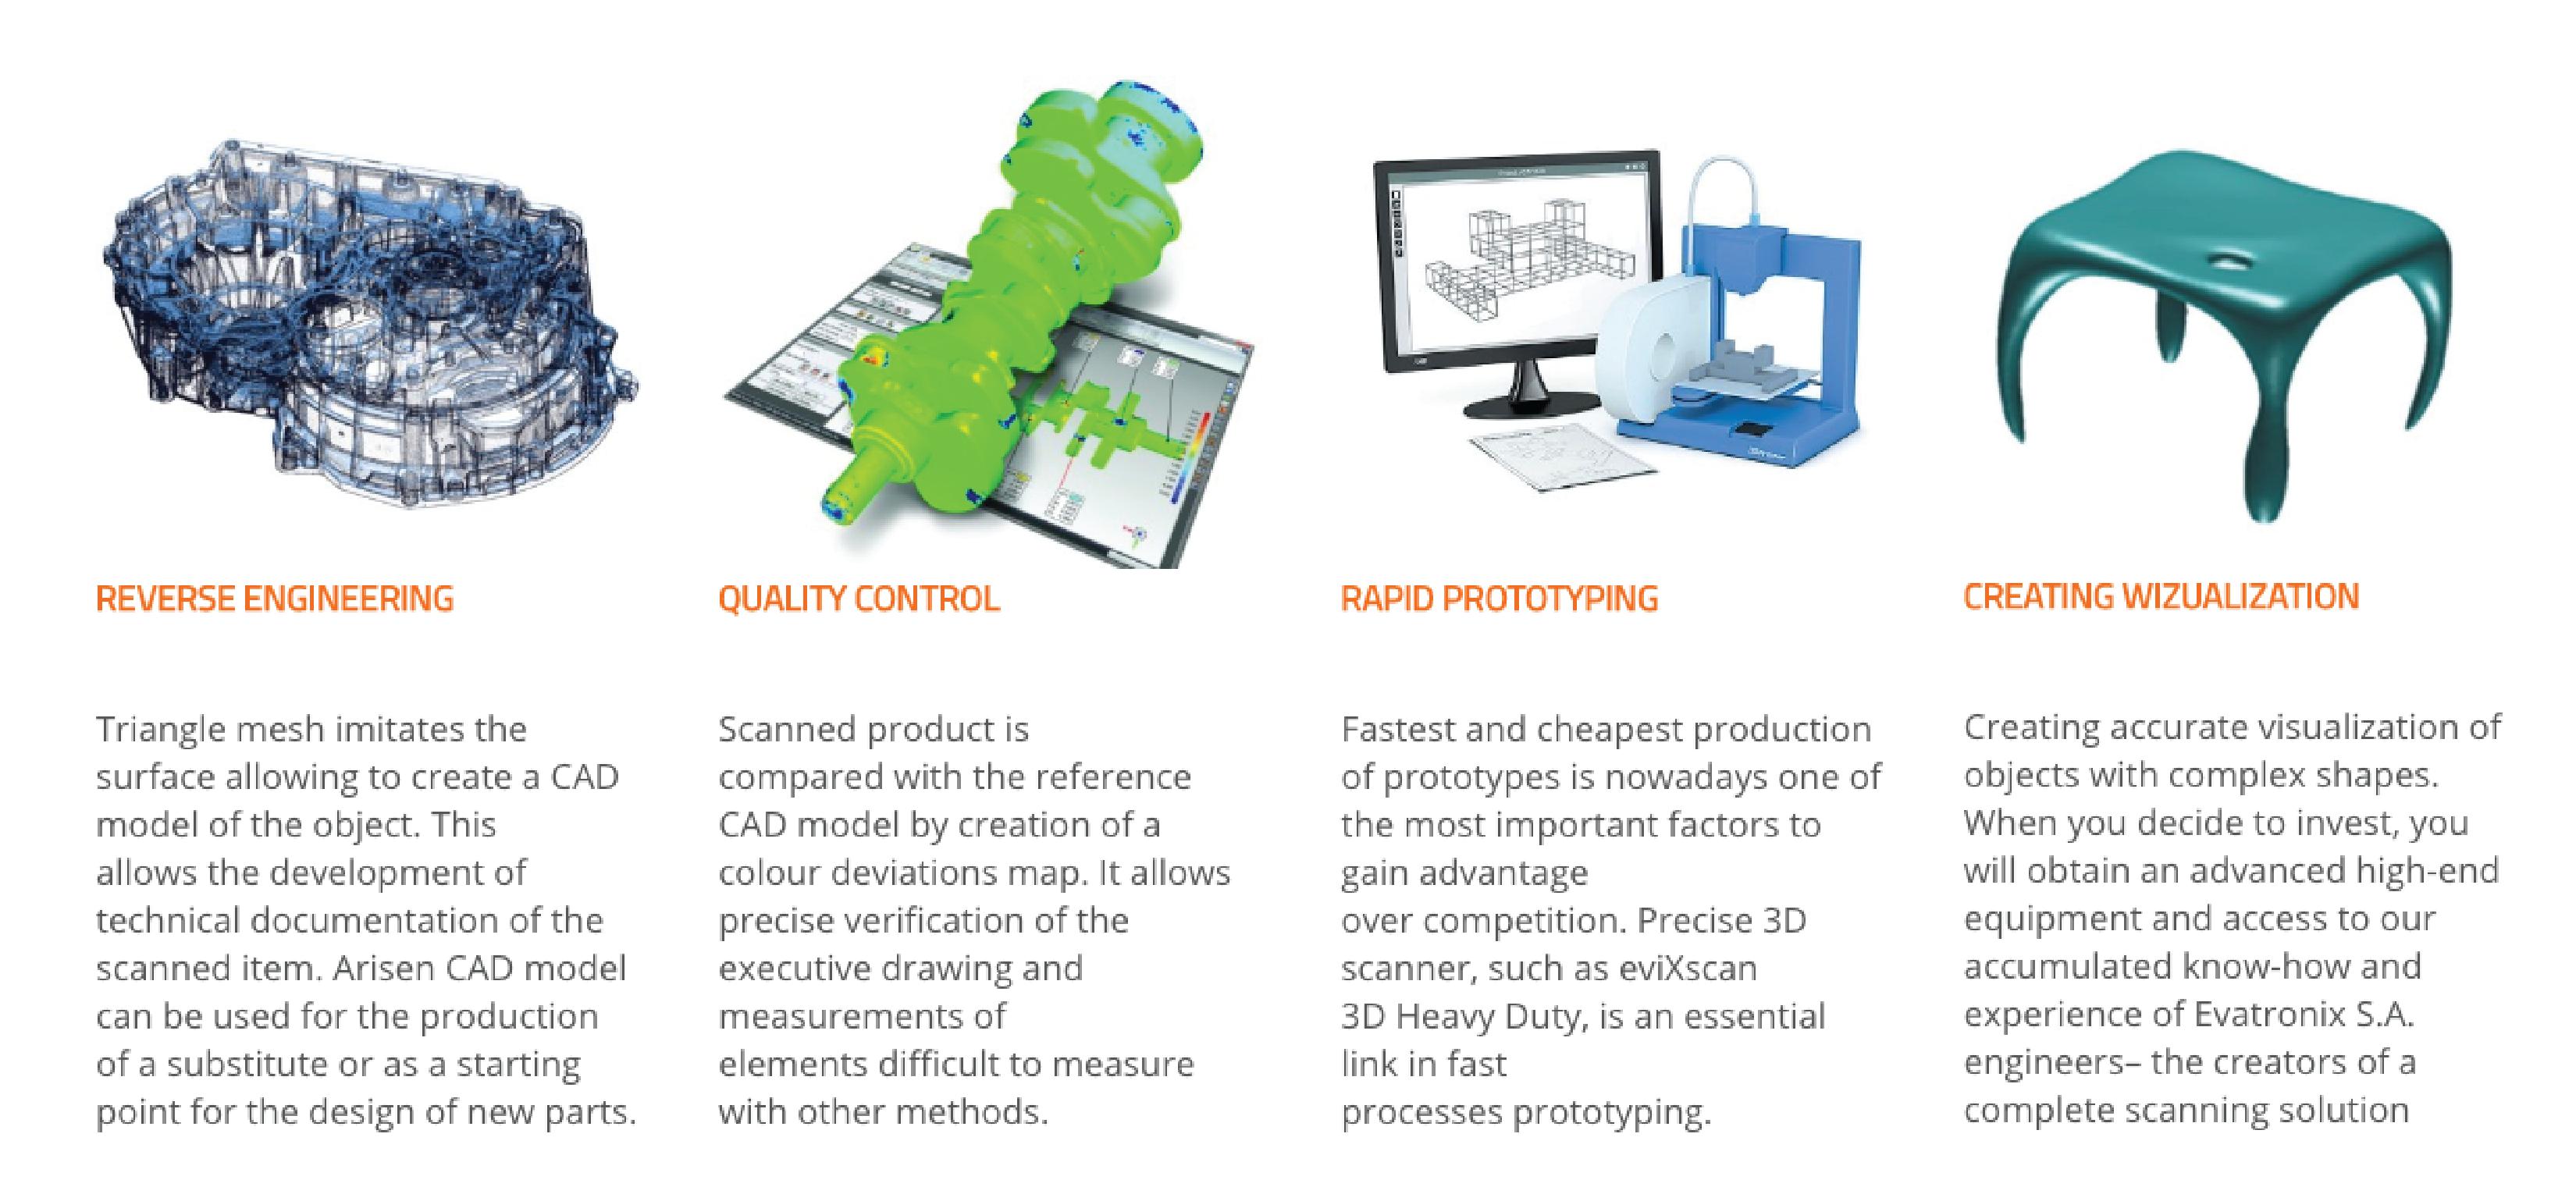 evatronix scanner applications